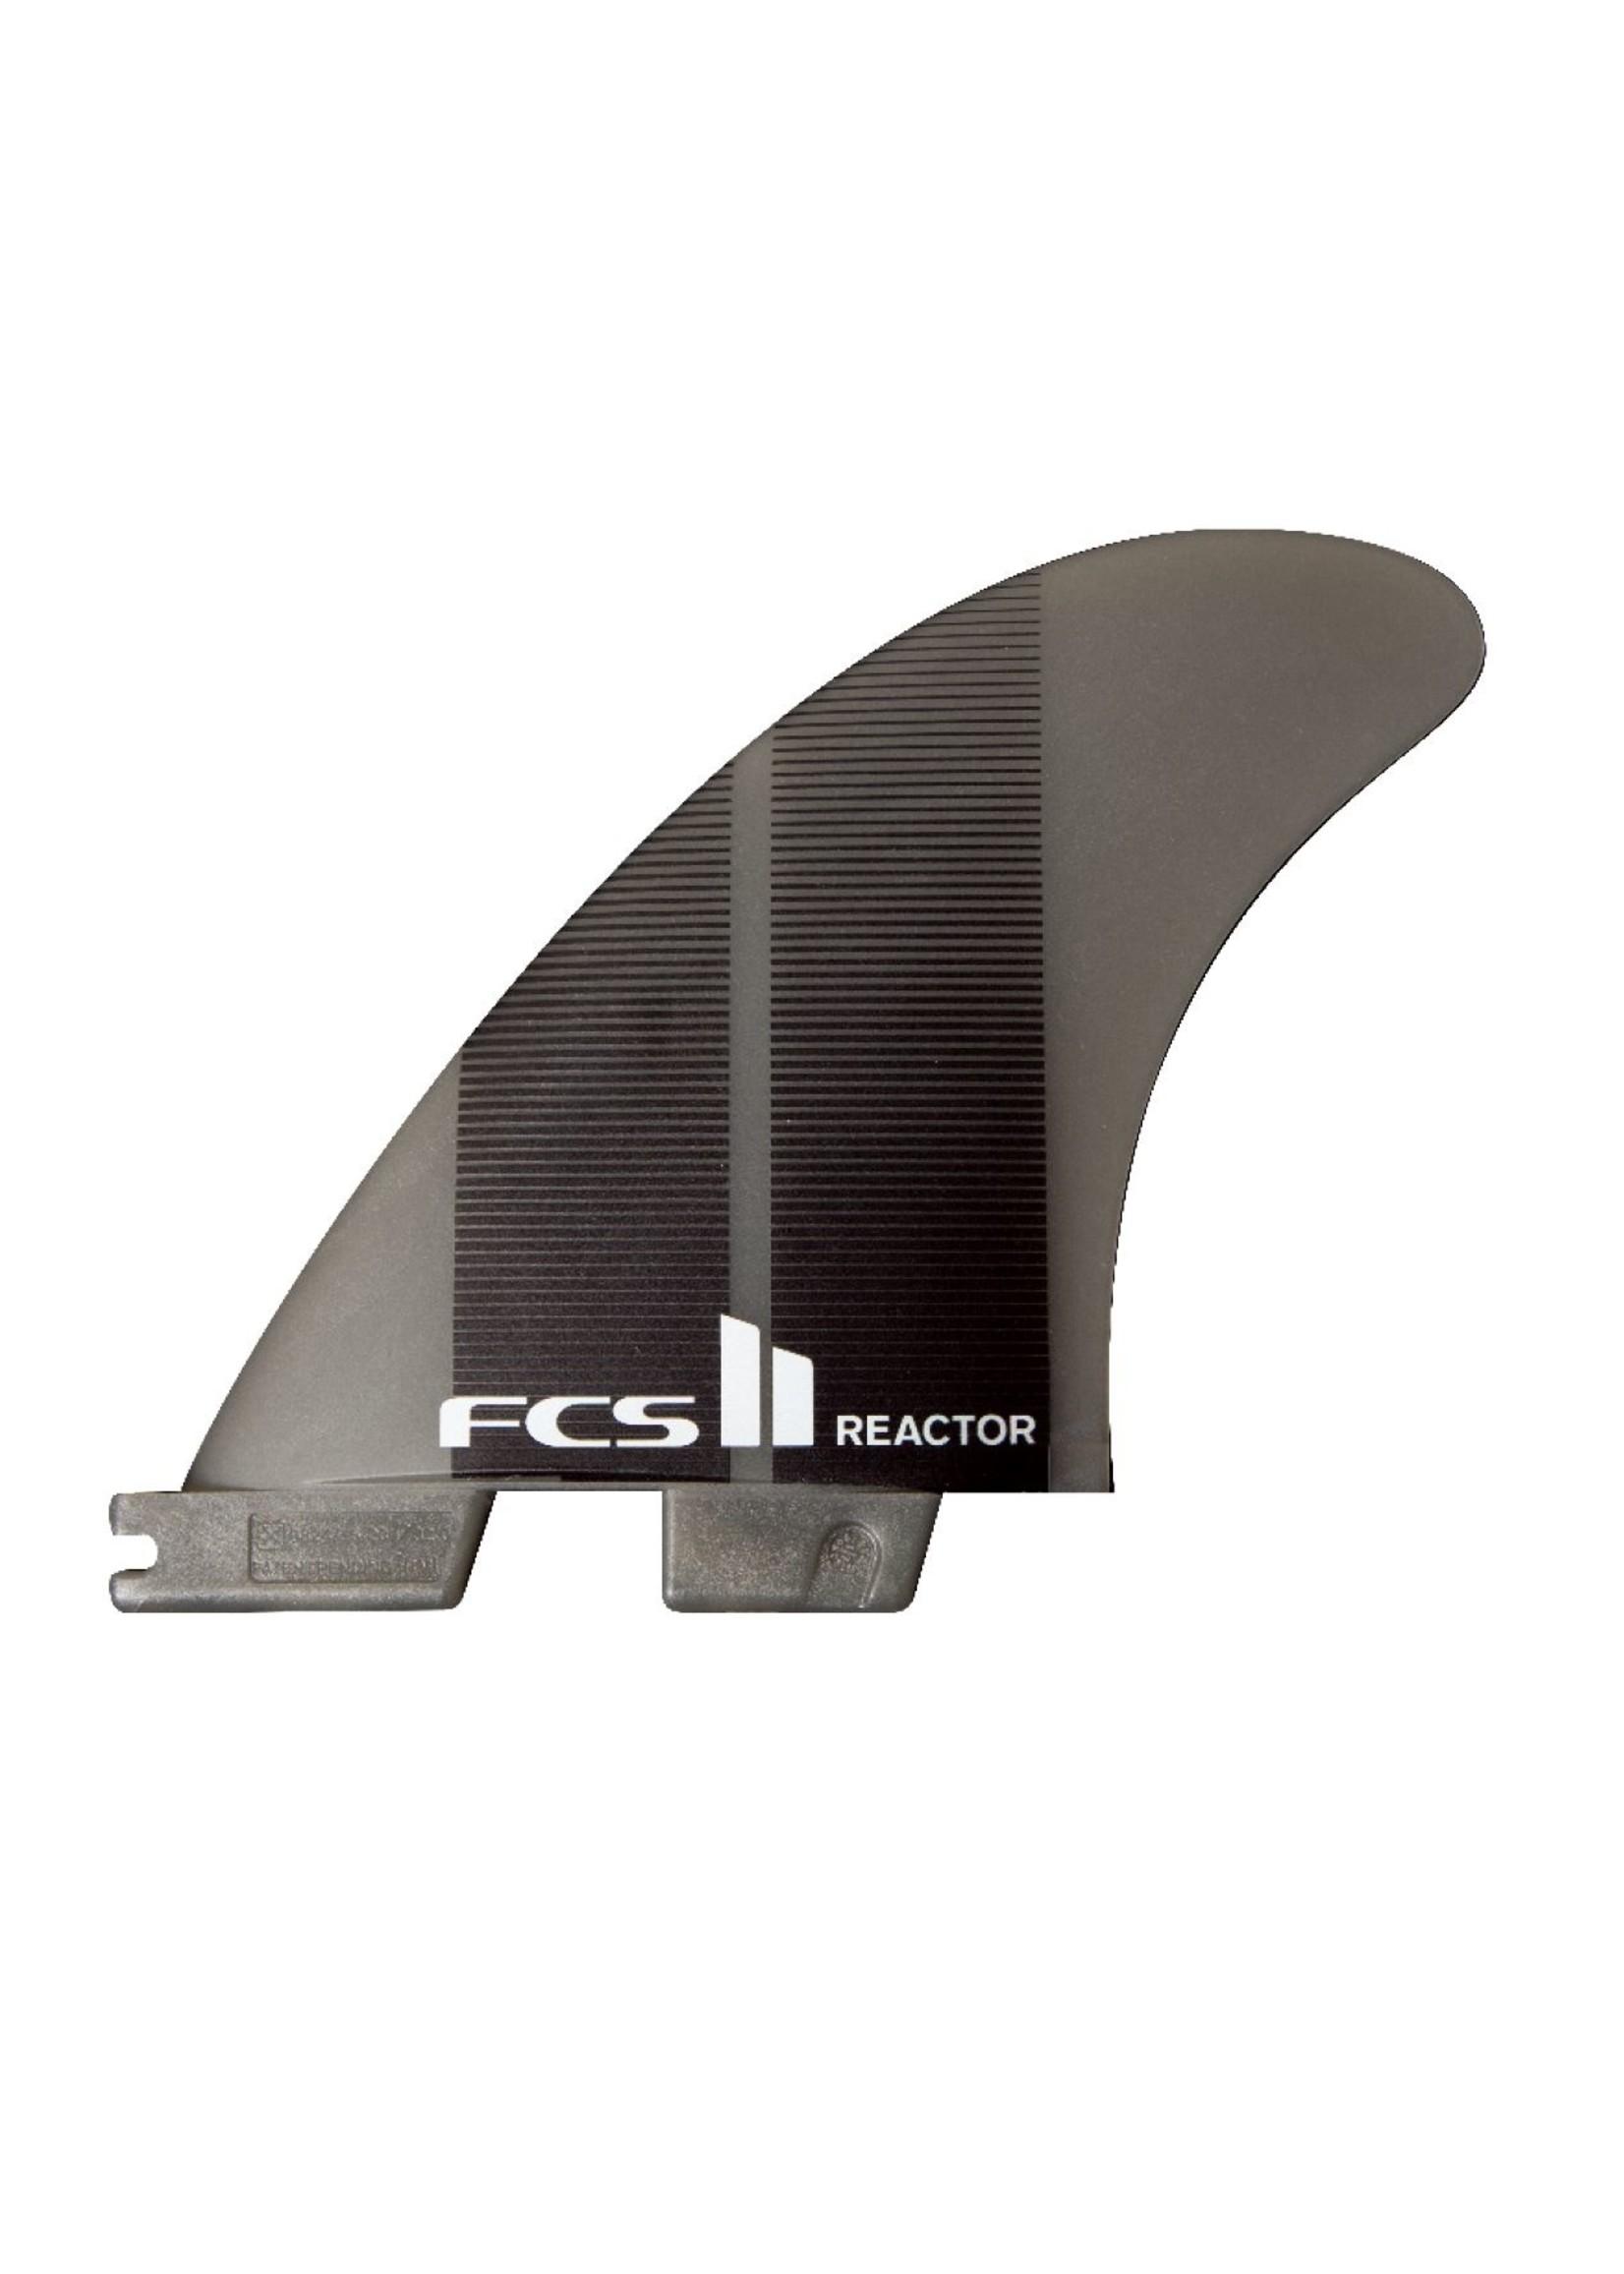 FCS FCS II REACTOR NEO GLASS (MEDIUM) TRI FINS